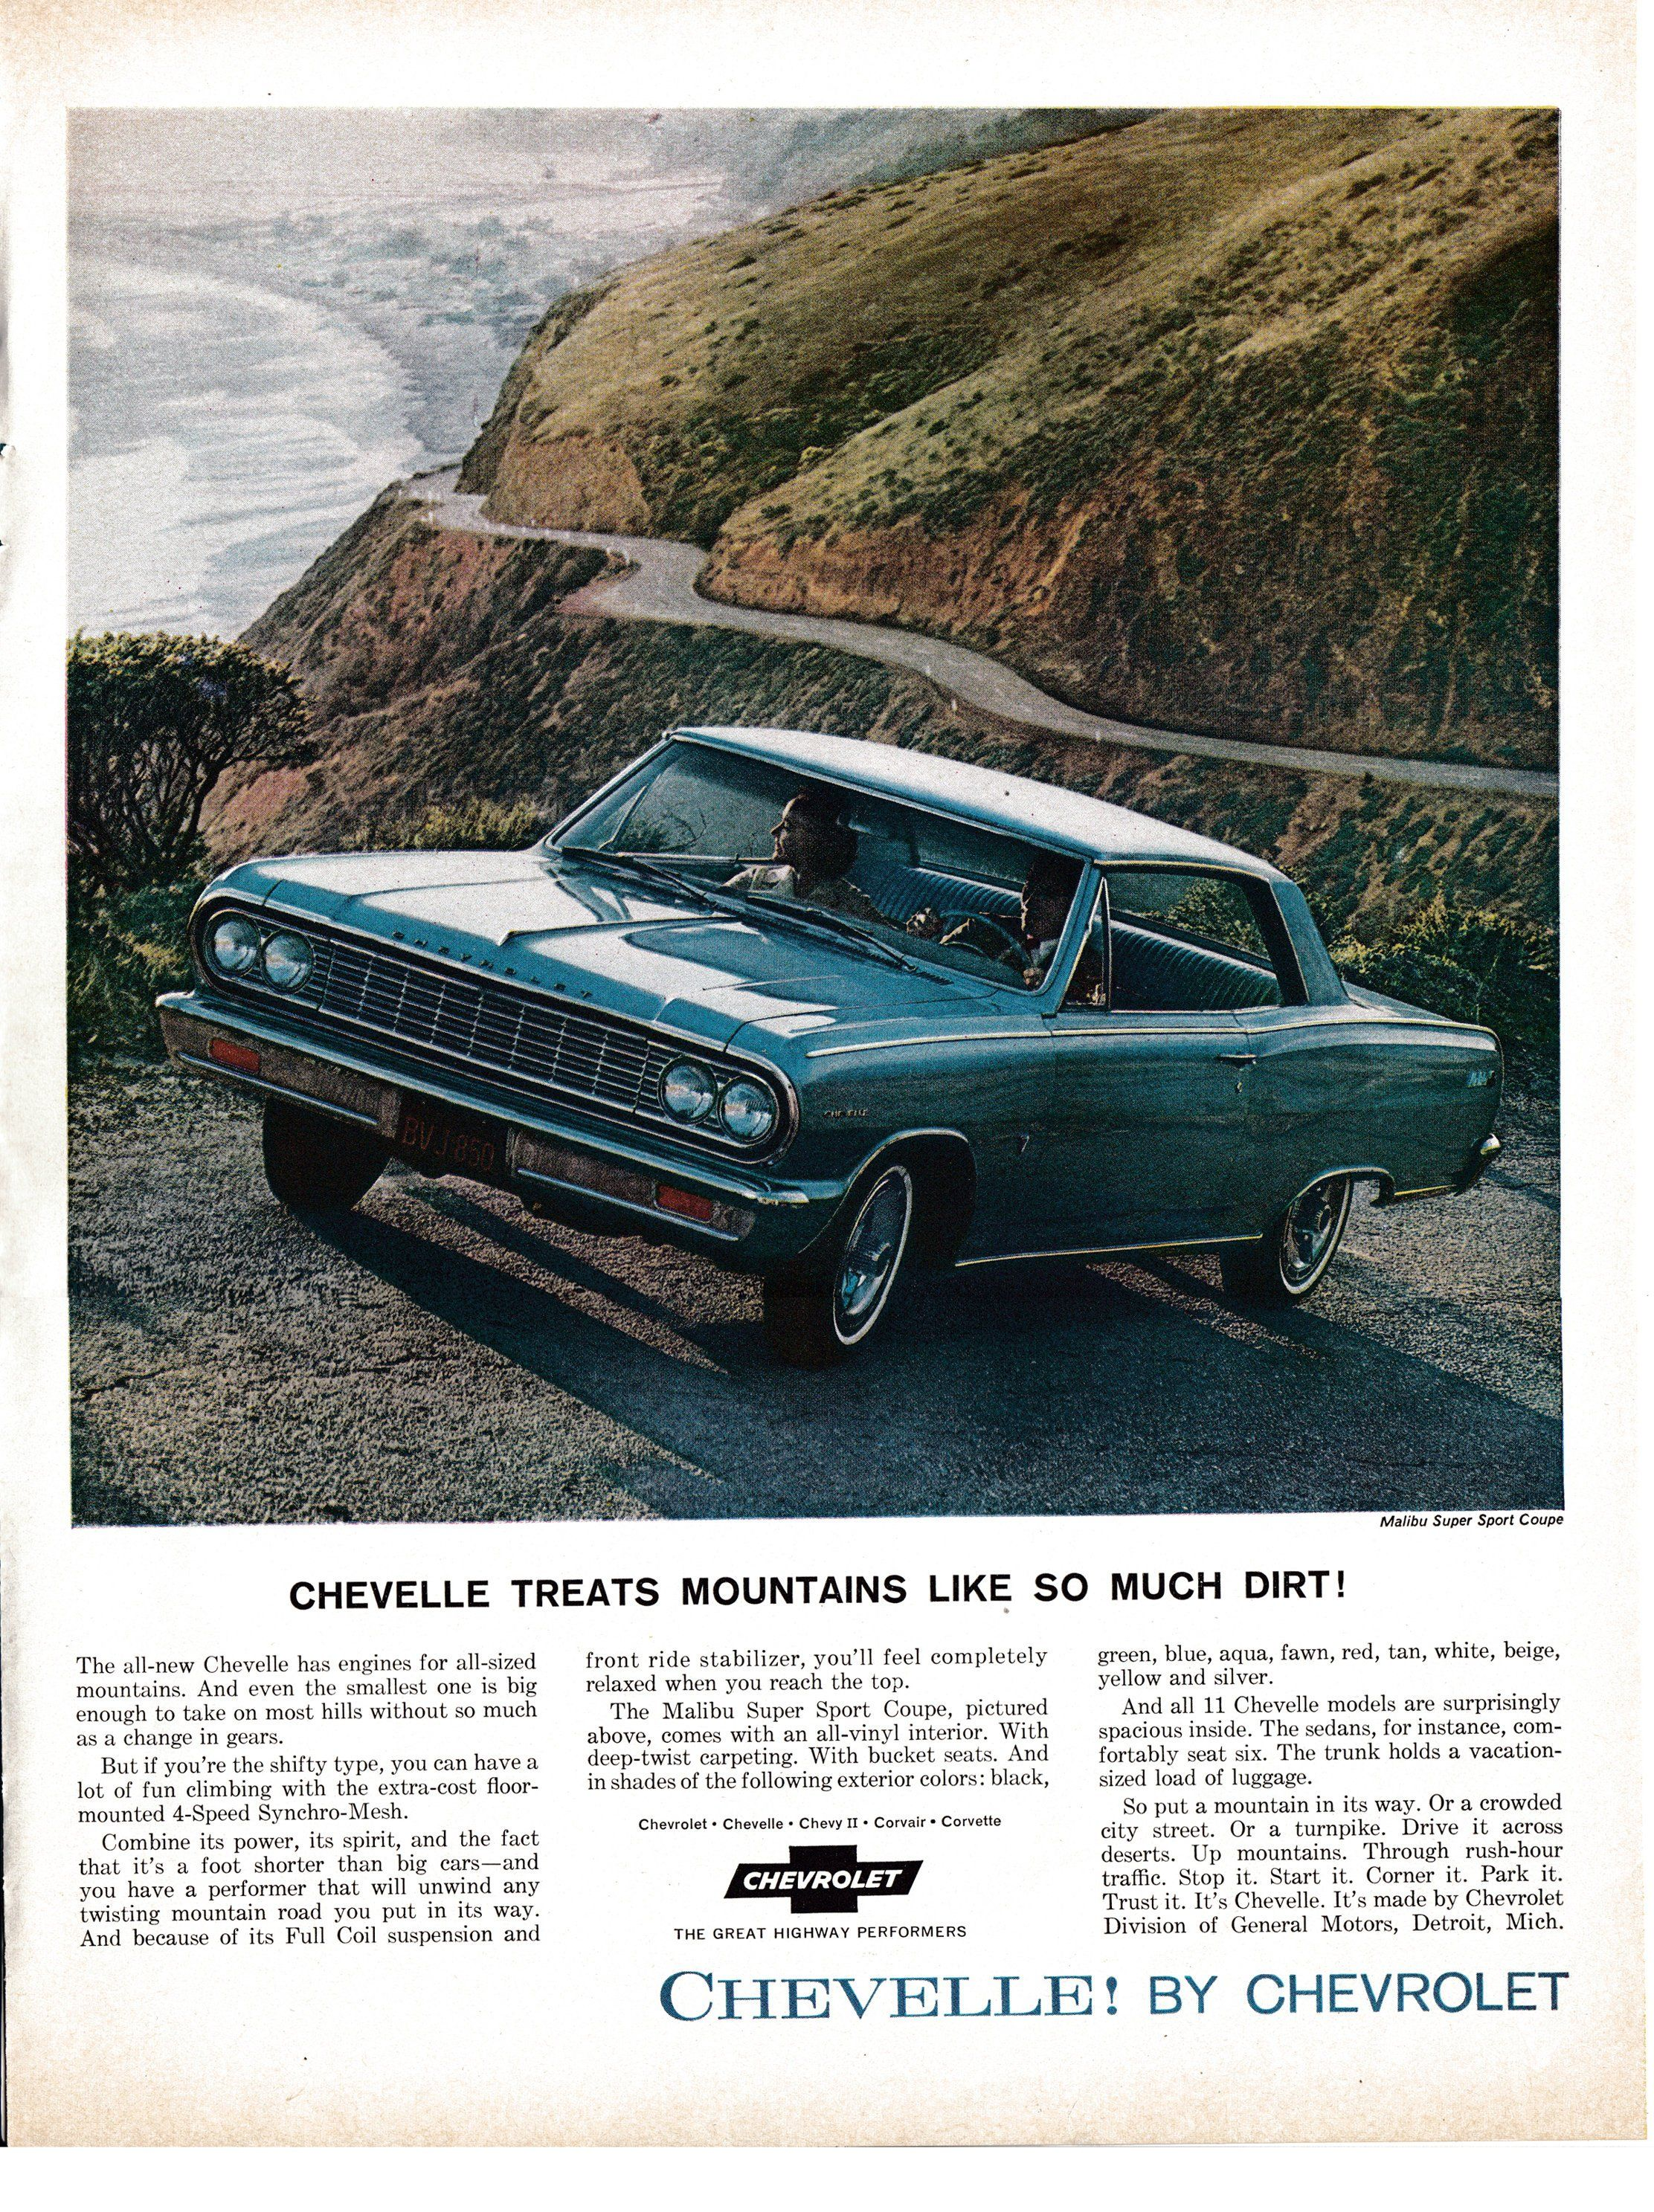 1964 Chevrolet Chevelle Malibu Super Sports Coupe Original Etsy Chevrolet Chevelle Chevrolet Chevelle Malibu Chevelle